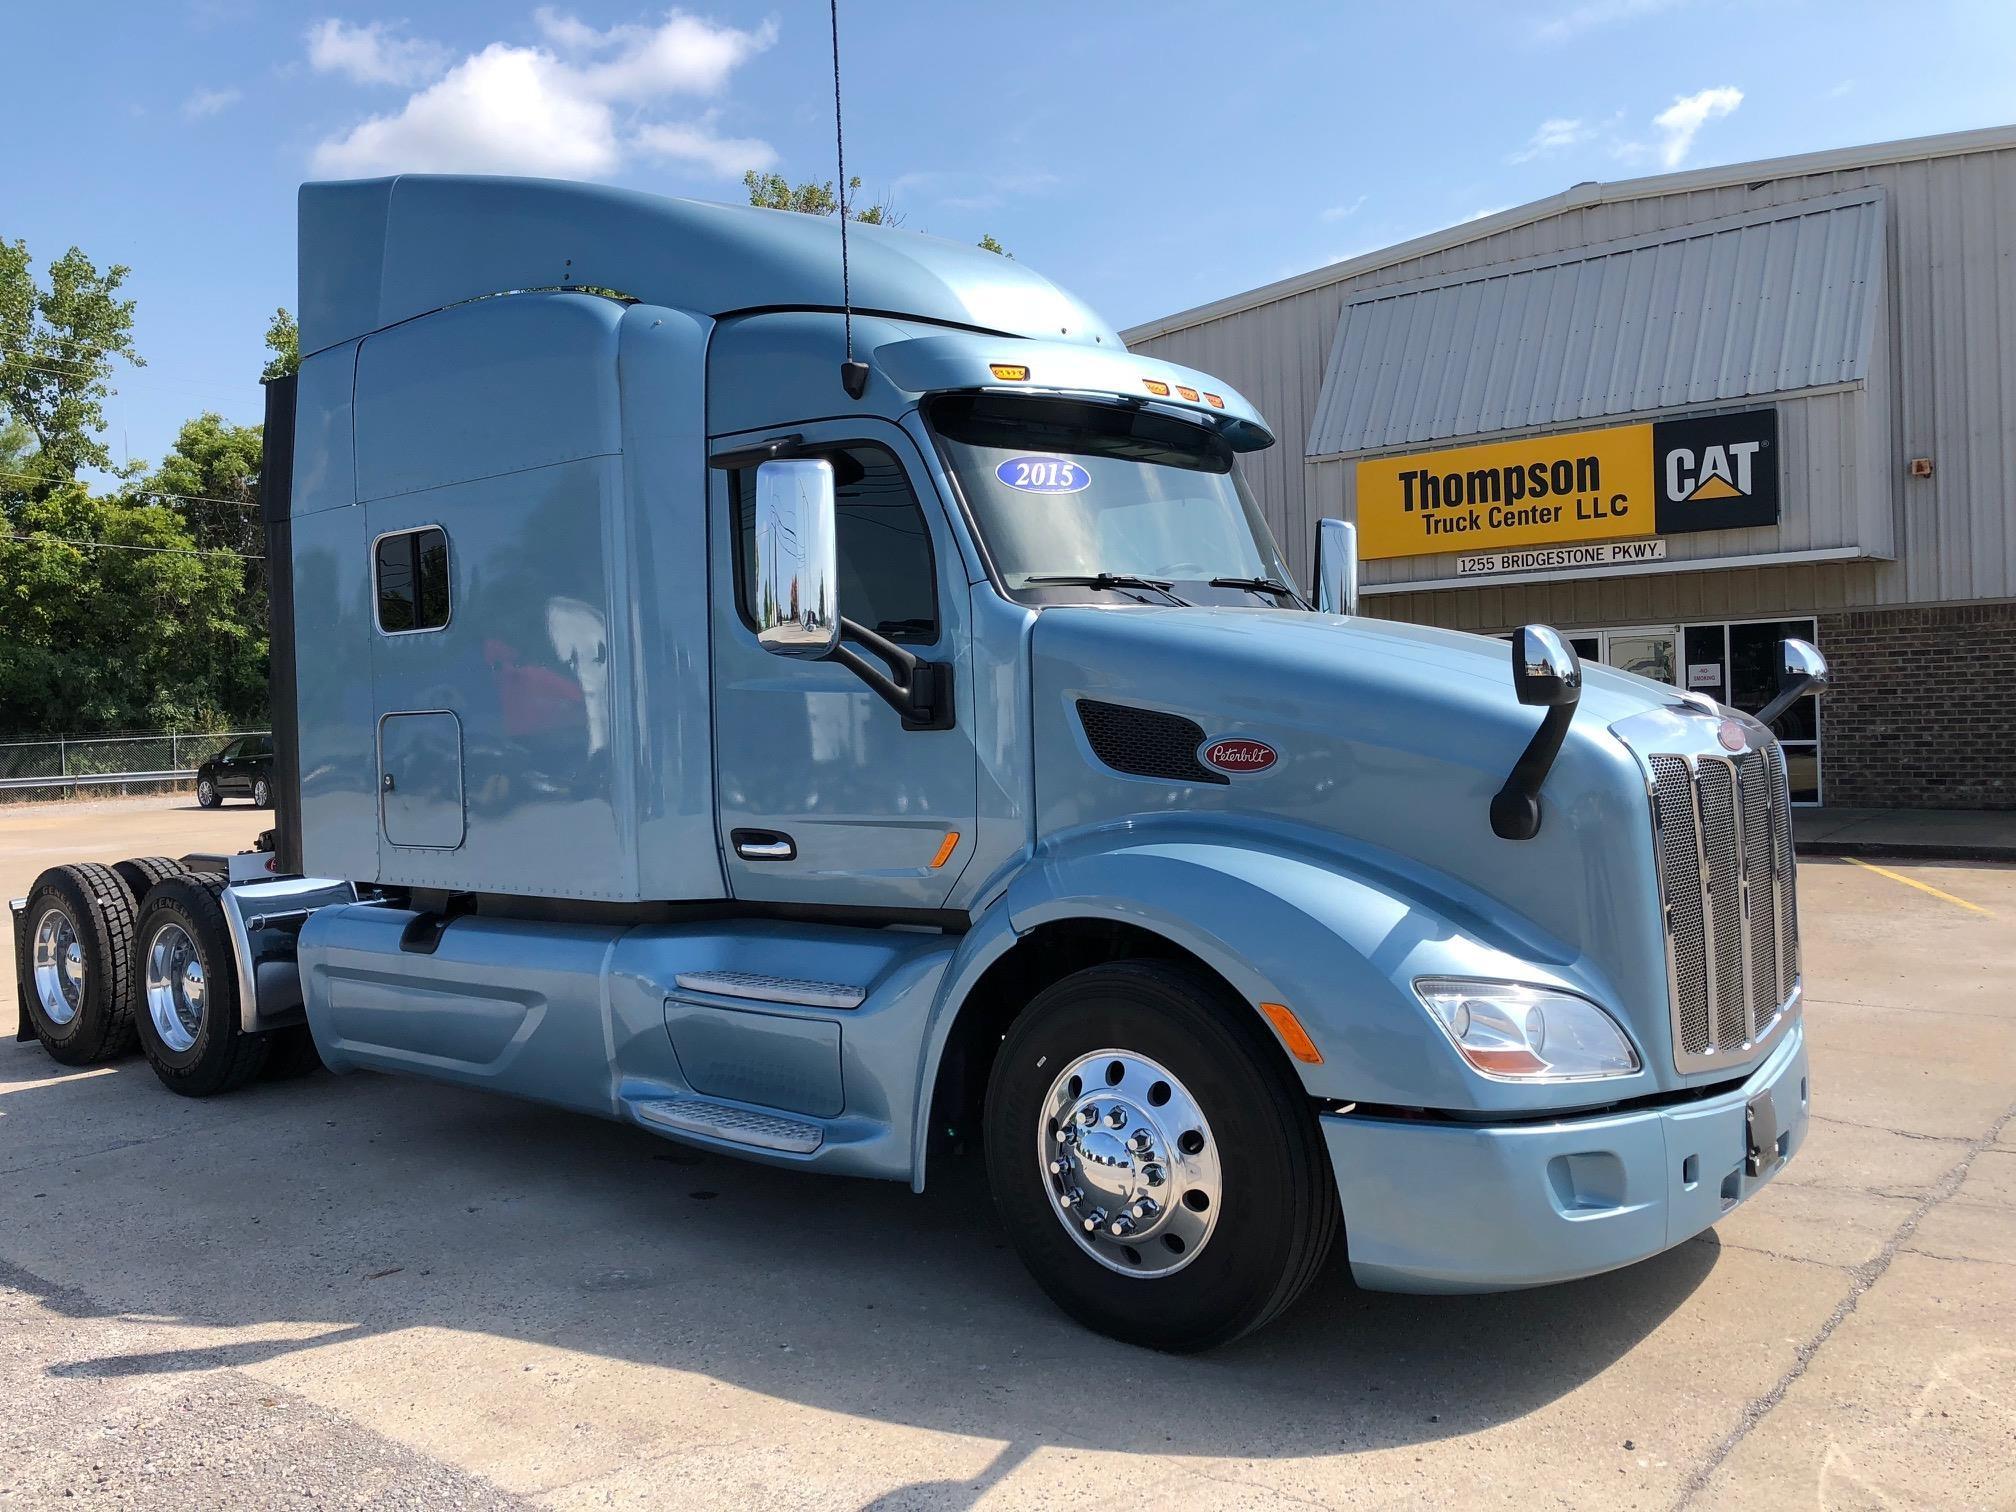 Used Heavy Duty Trucks For Sale - Thompson Machinery